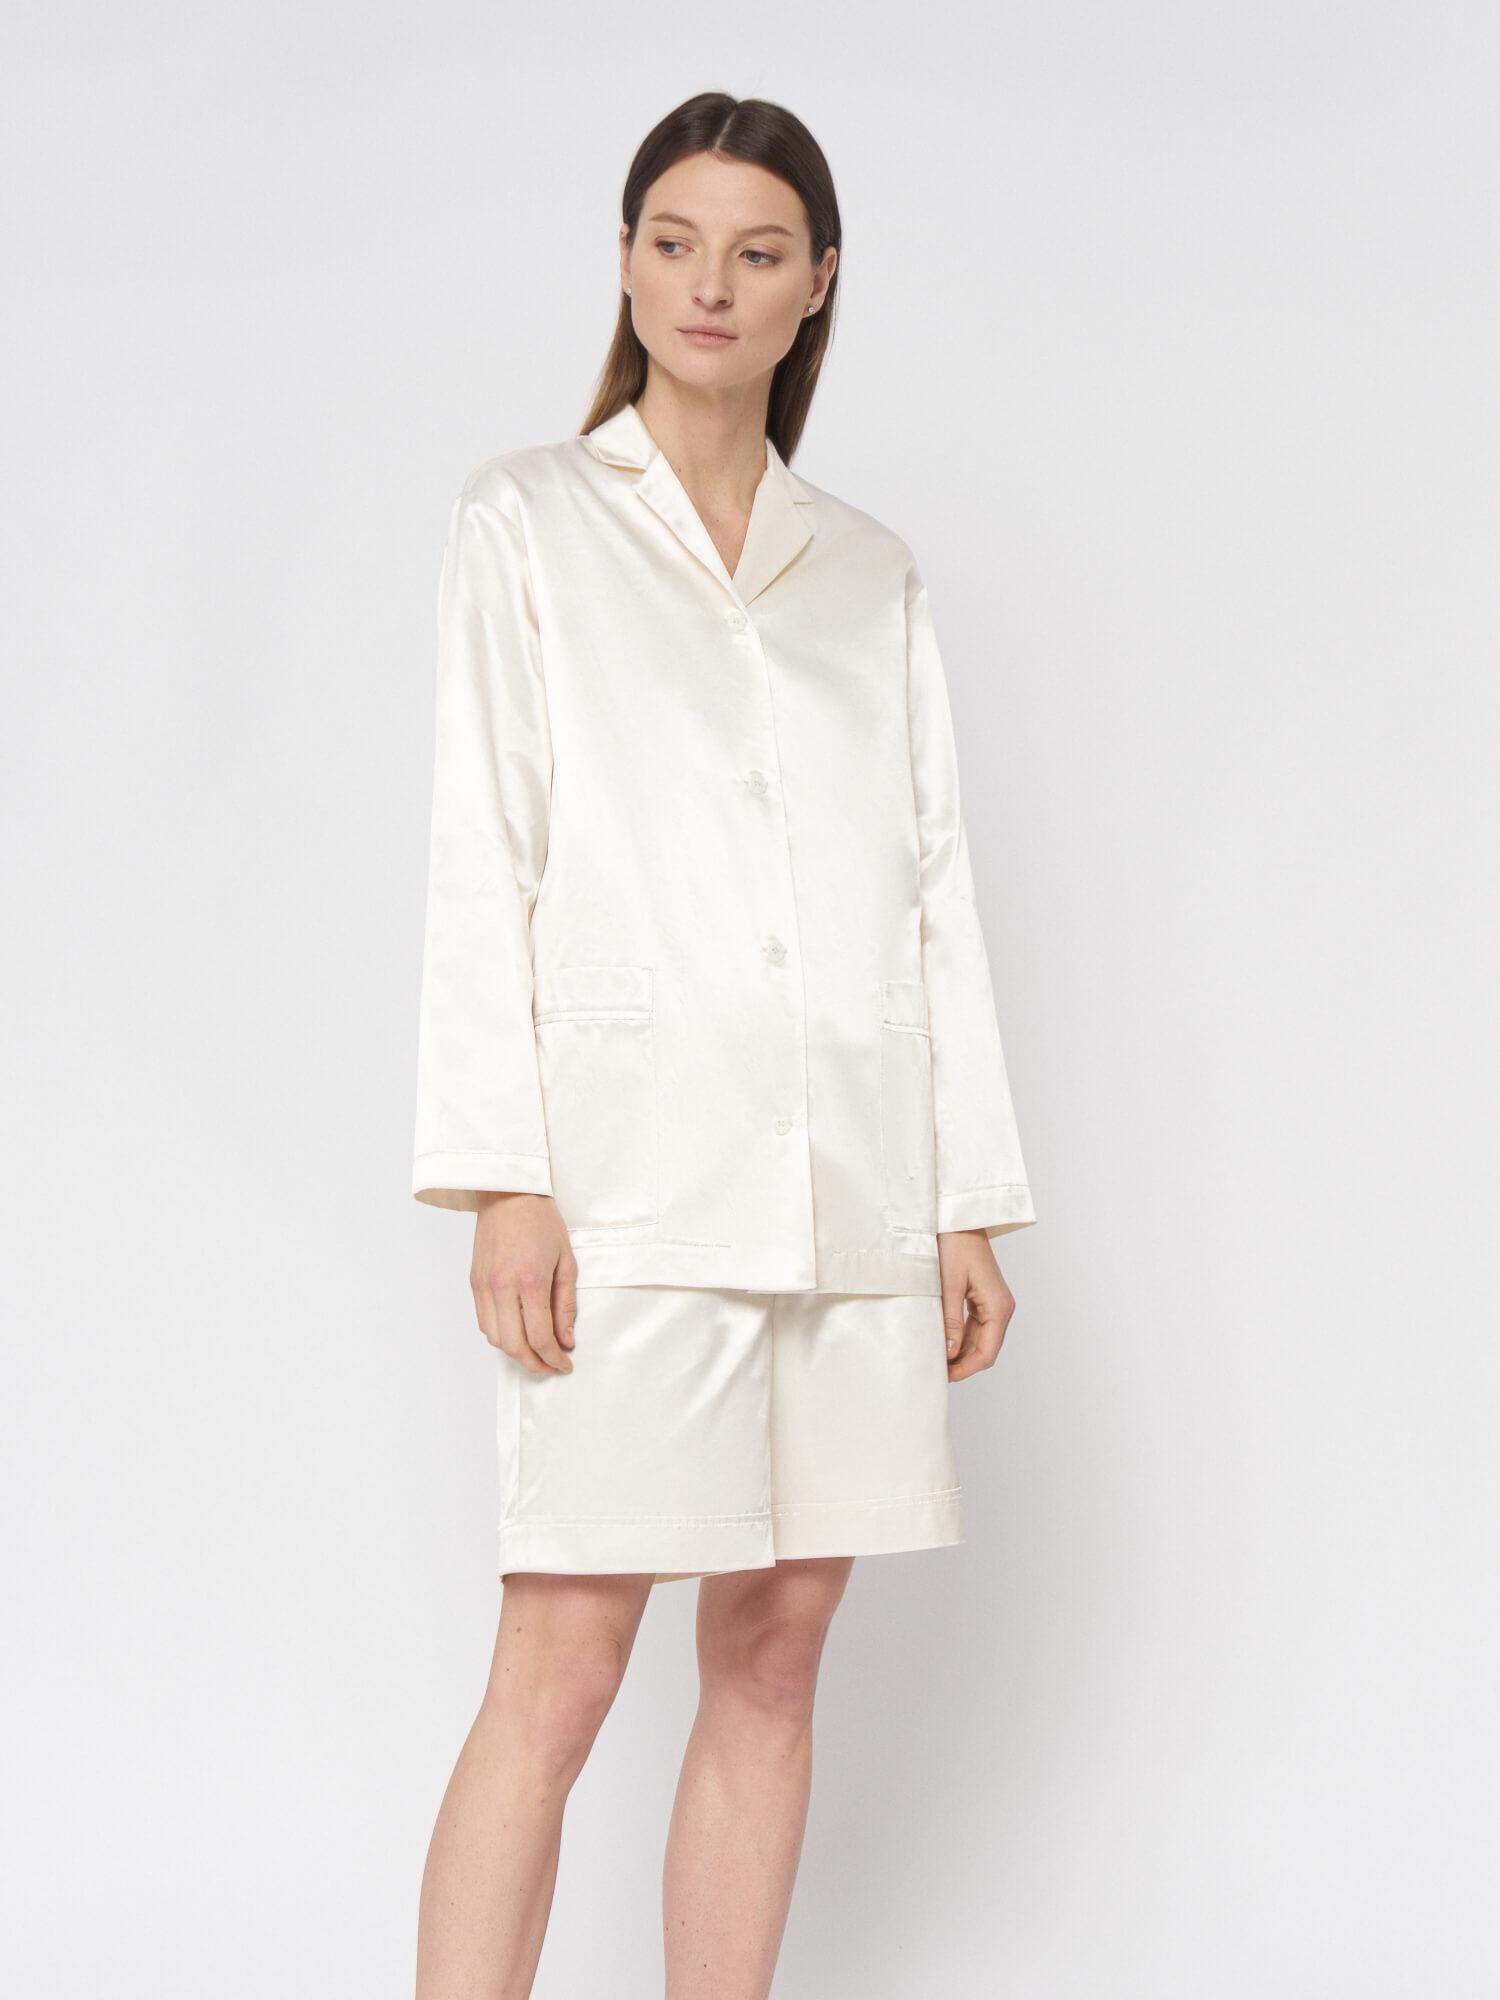 Блуза атласная Denise в пижамном стиле